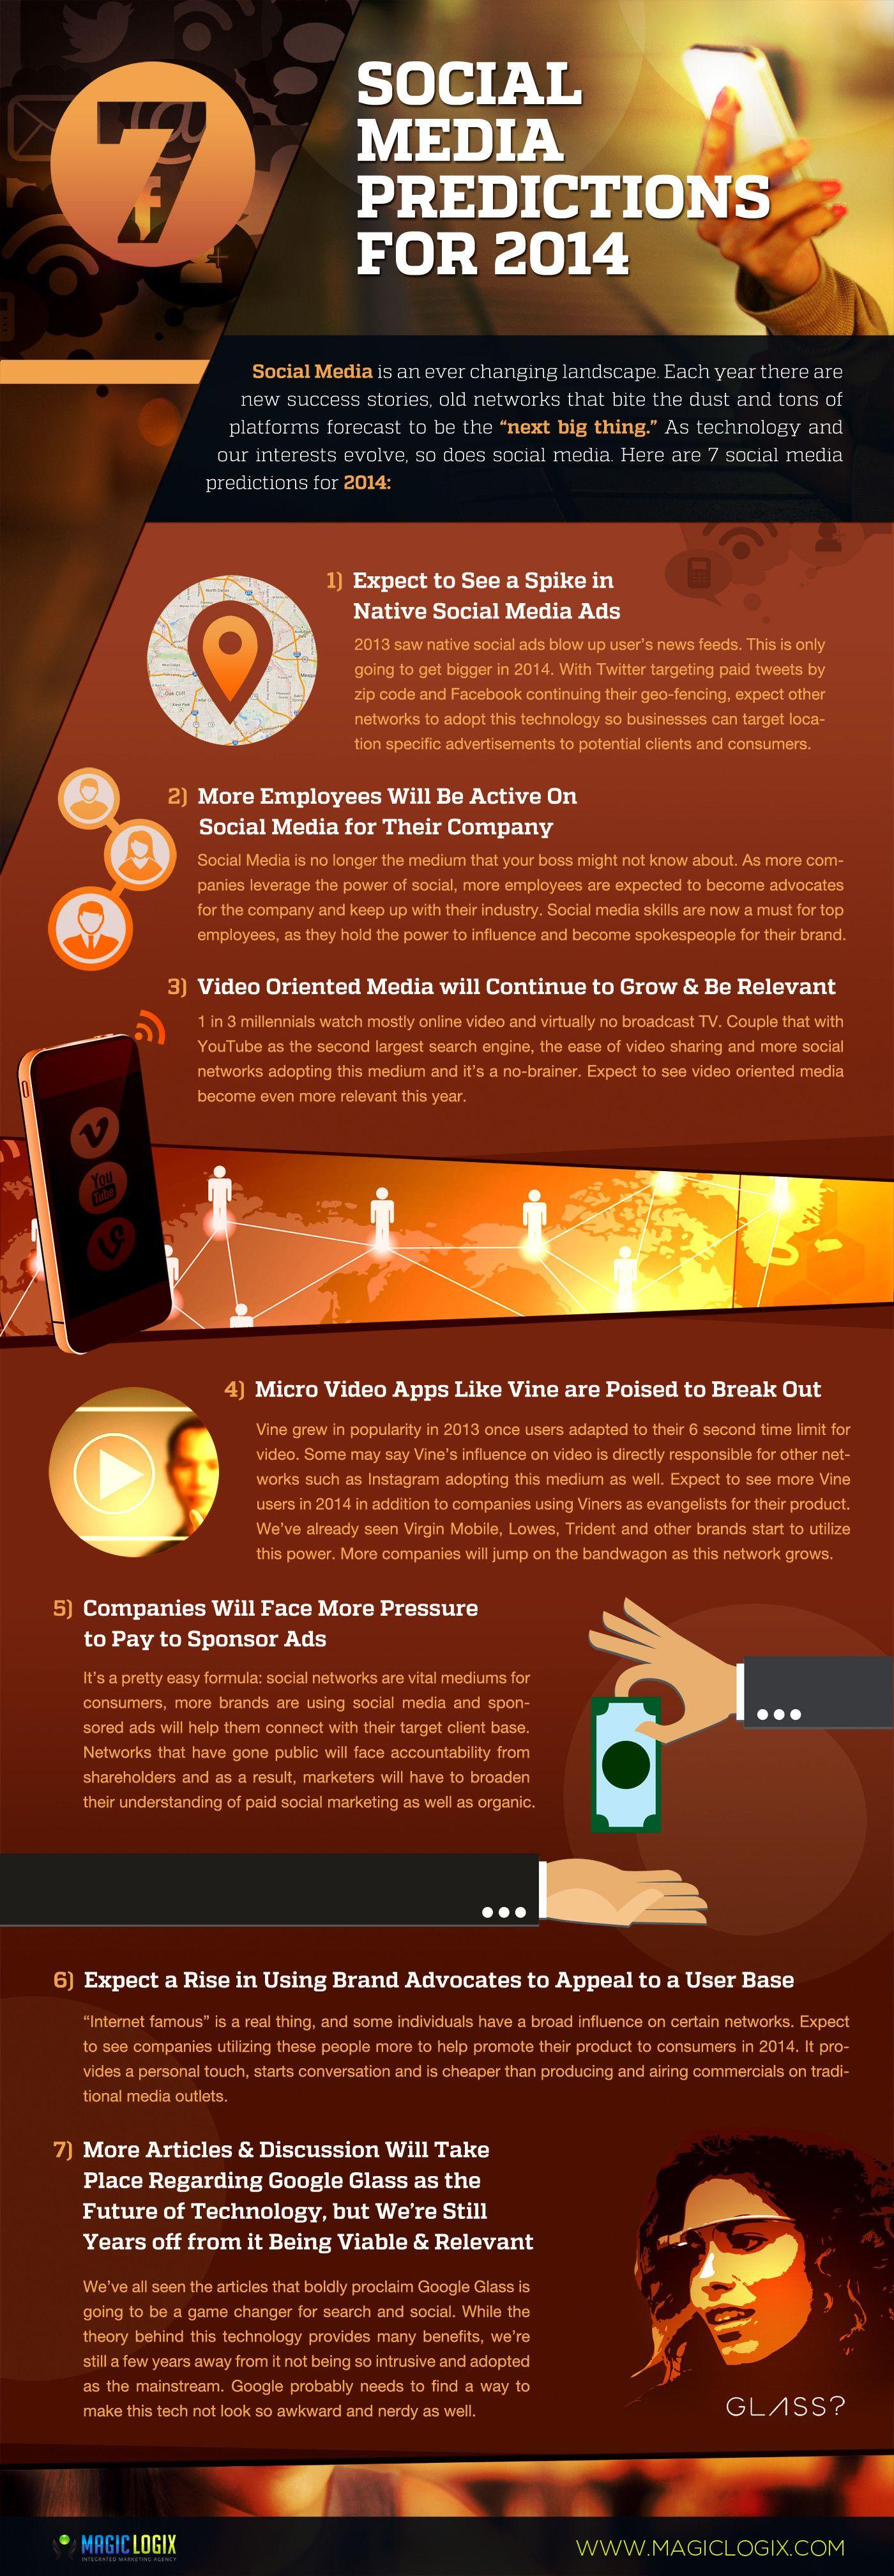 7 #socialmedia prediction for 2014 - #infographic                 http://www.icesugarmedia.com/social-media-marketing-consultants